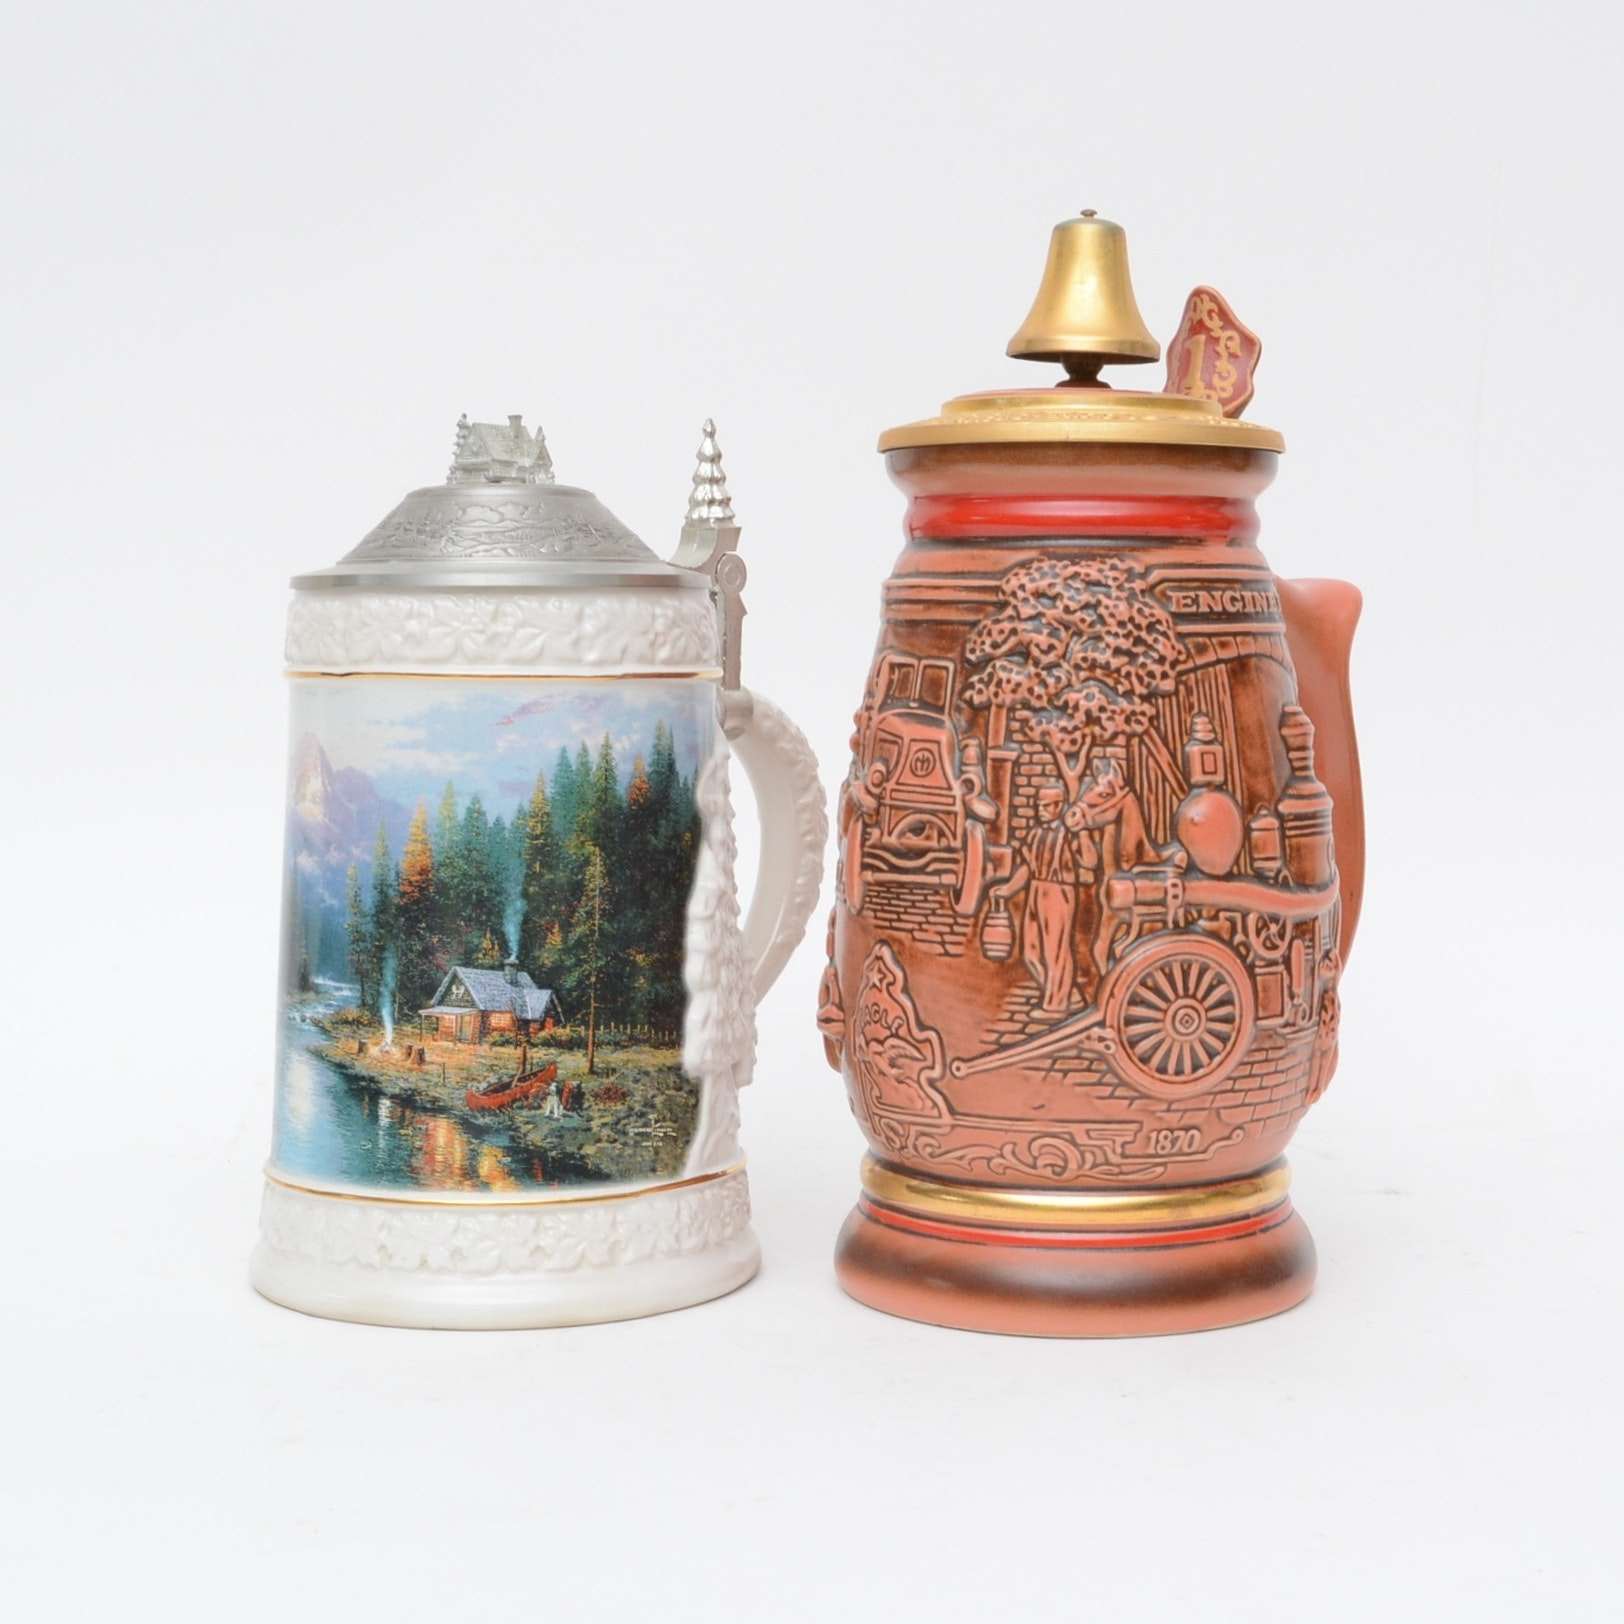 Vintage Beer Steins with Thomas Kinkade